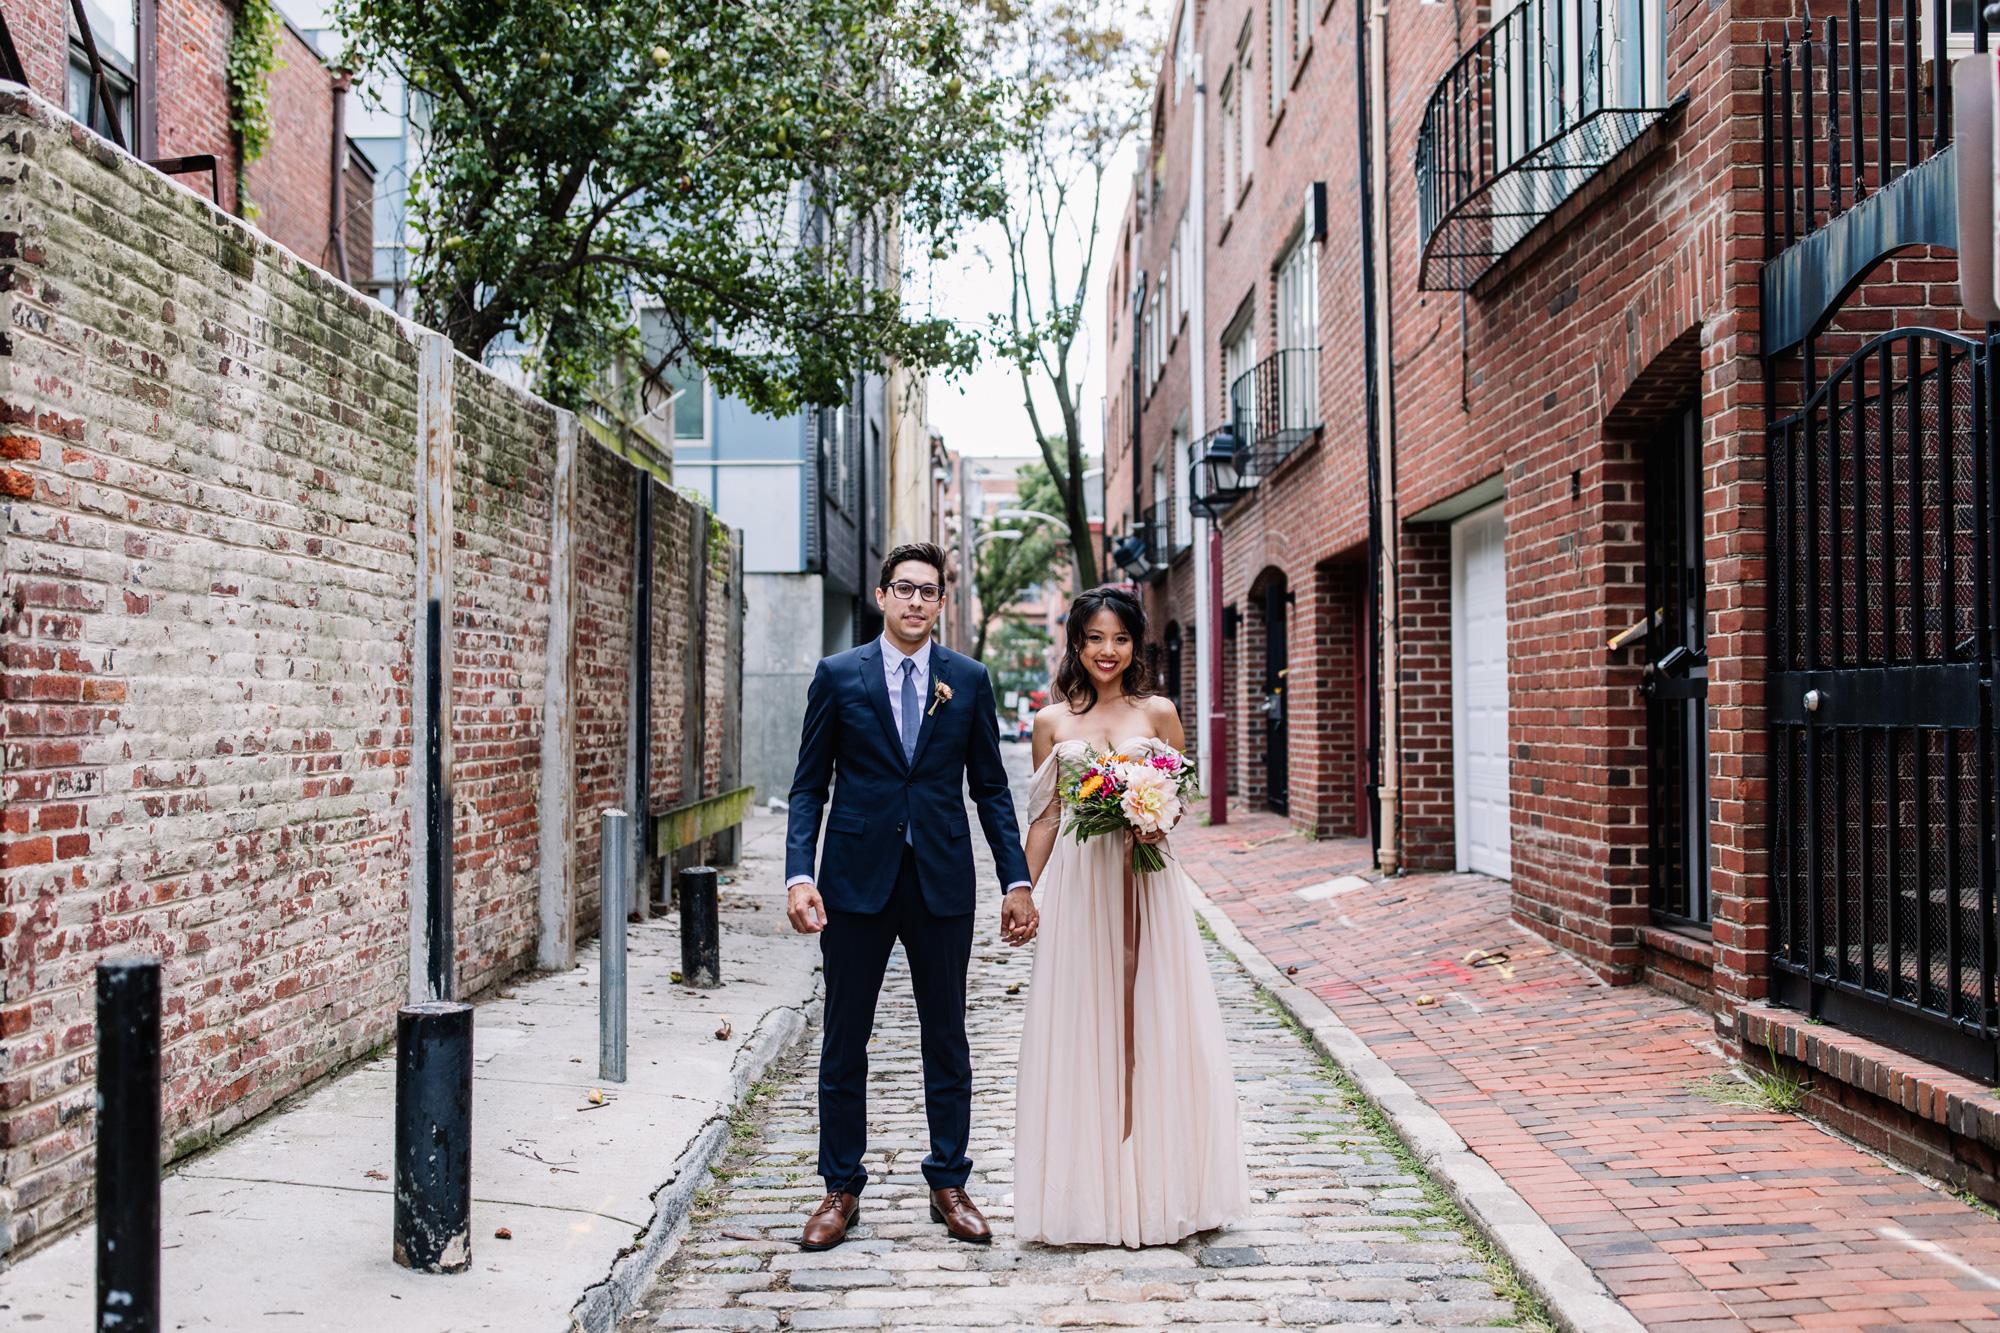 Philadelphia Wedding Planner Heart & Dash | Old City Wedding at Twisted Tail | Brittney Raine Photography